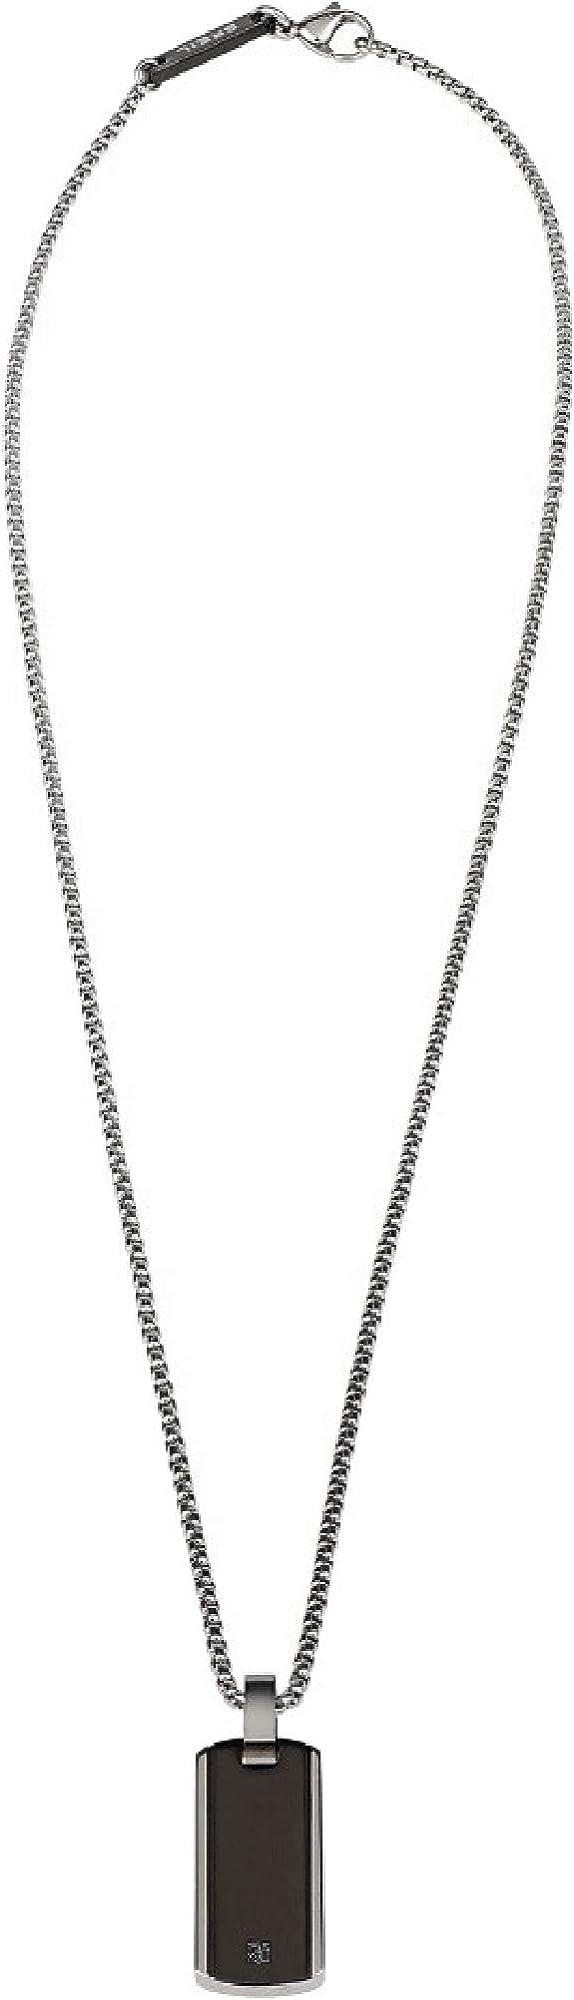 Breil collana uomo in acciaio lucido con pendente in acciaio color gun e diamante nero TJ2747